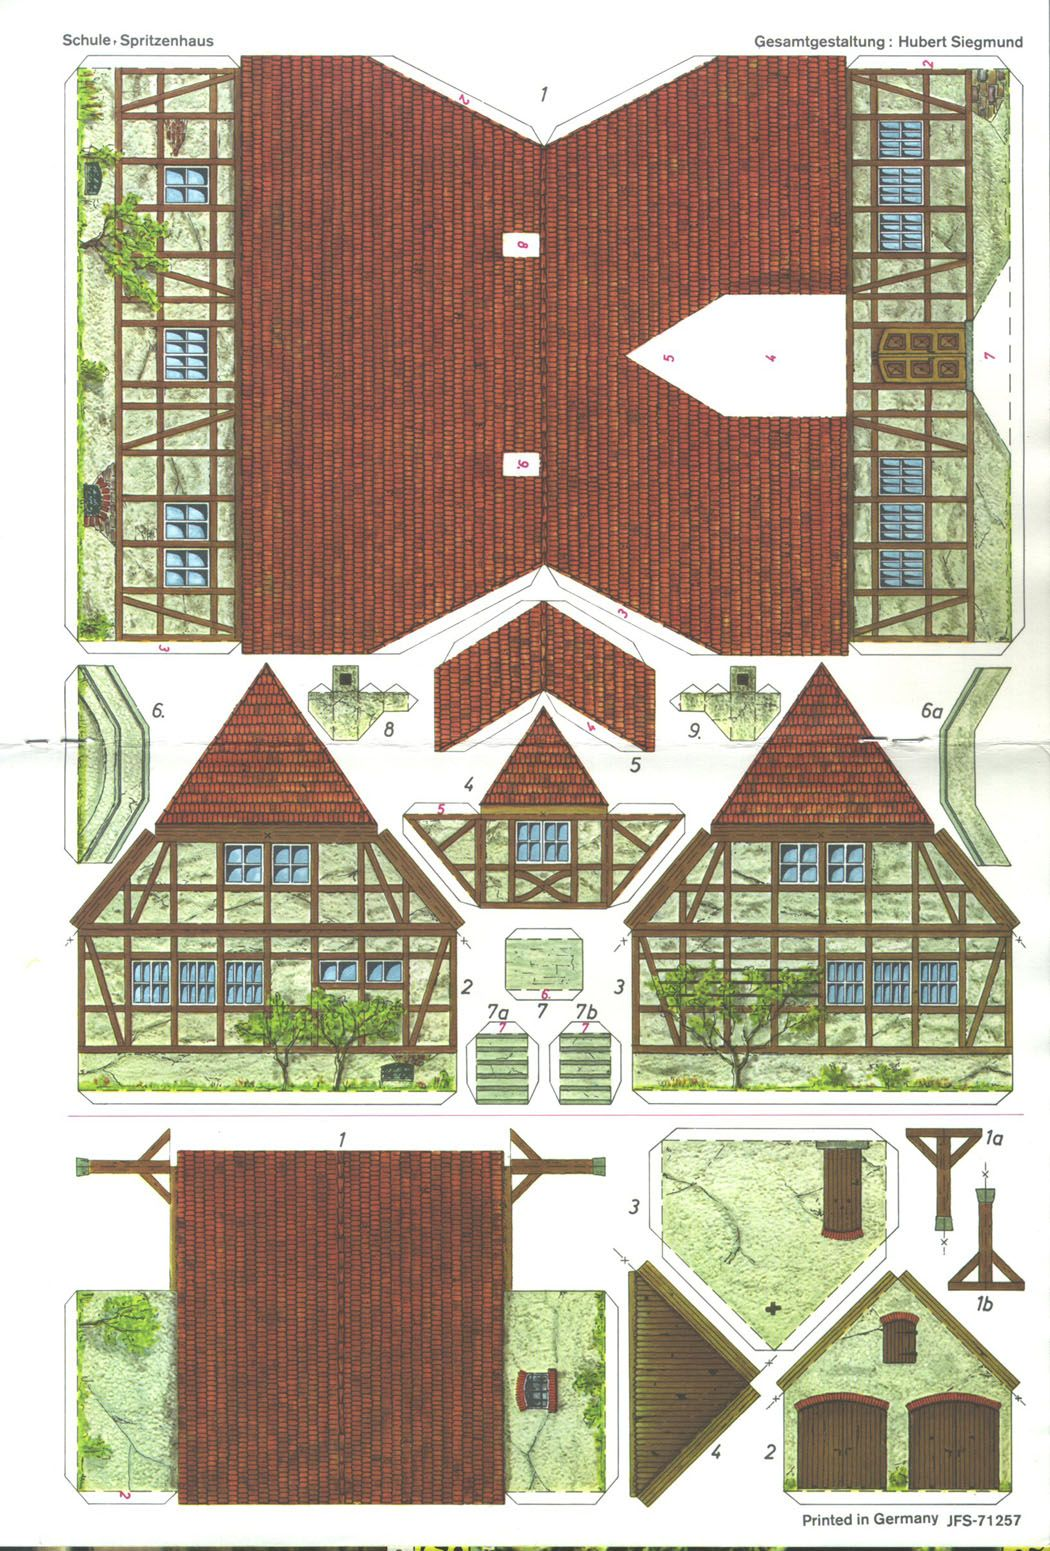 Vorschaubild der version vom 29 juli 2007 1431 uhr a vrosom vorschaubild der version vom 29 juli 2007 1431 uhr putz housesglitter housespaper jeuxipadfo Image collections